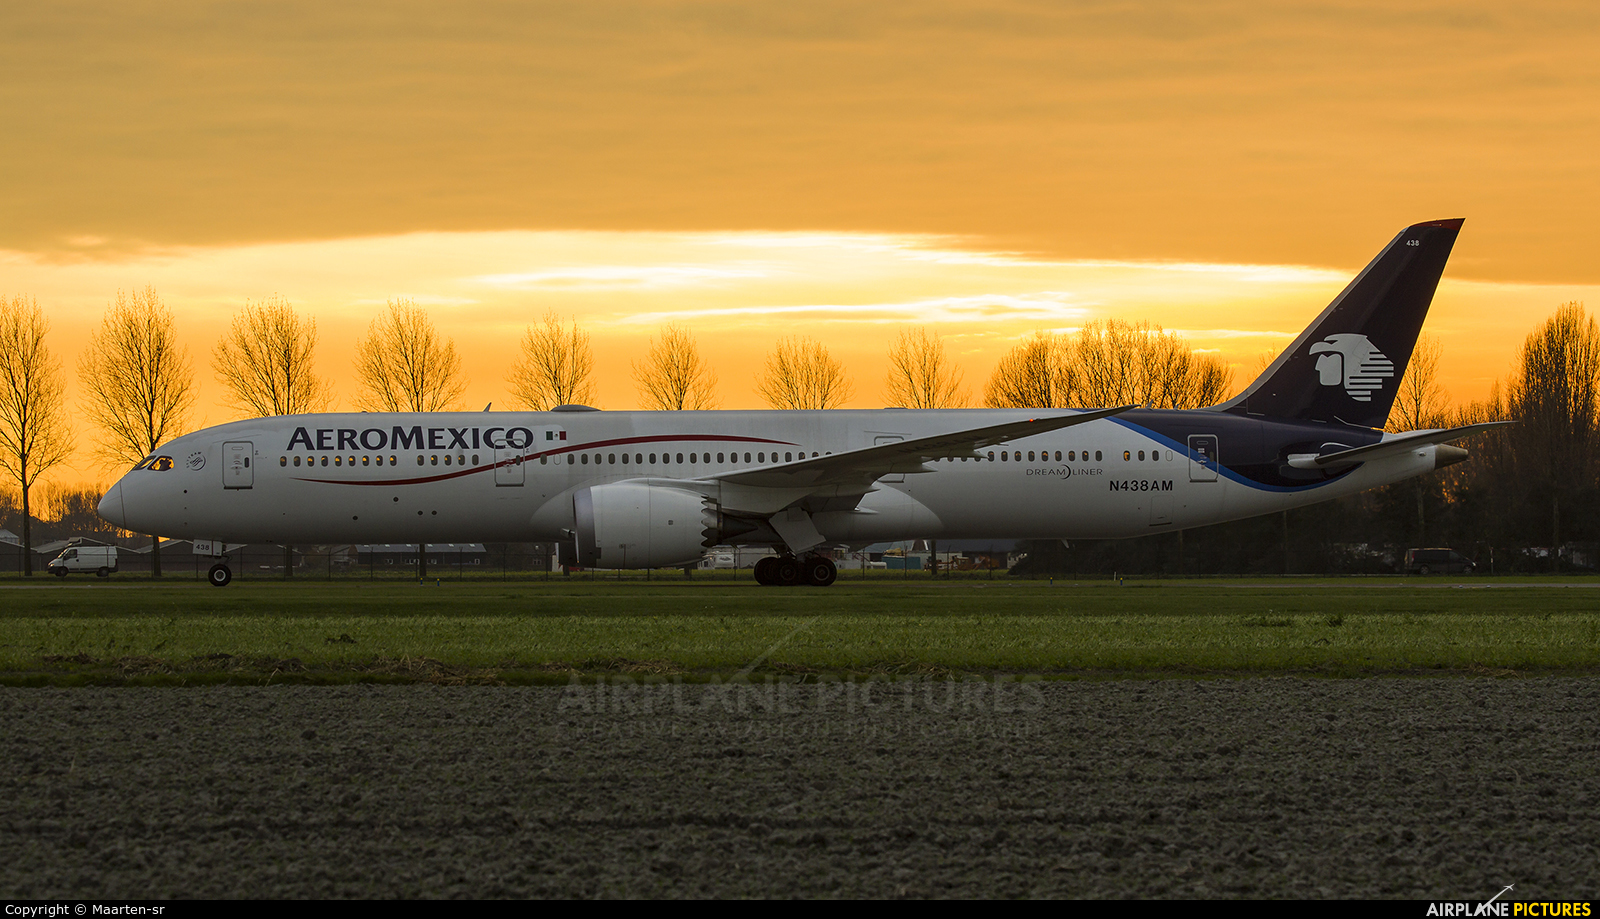 Aeromexico N438AM aircraft at Amsterdam - Schiphol